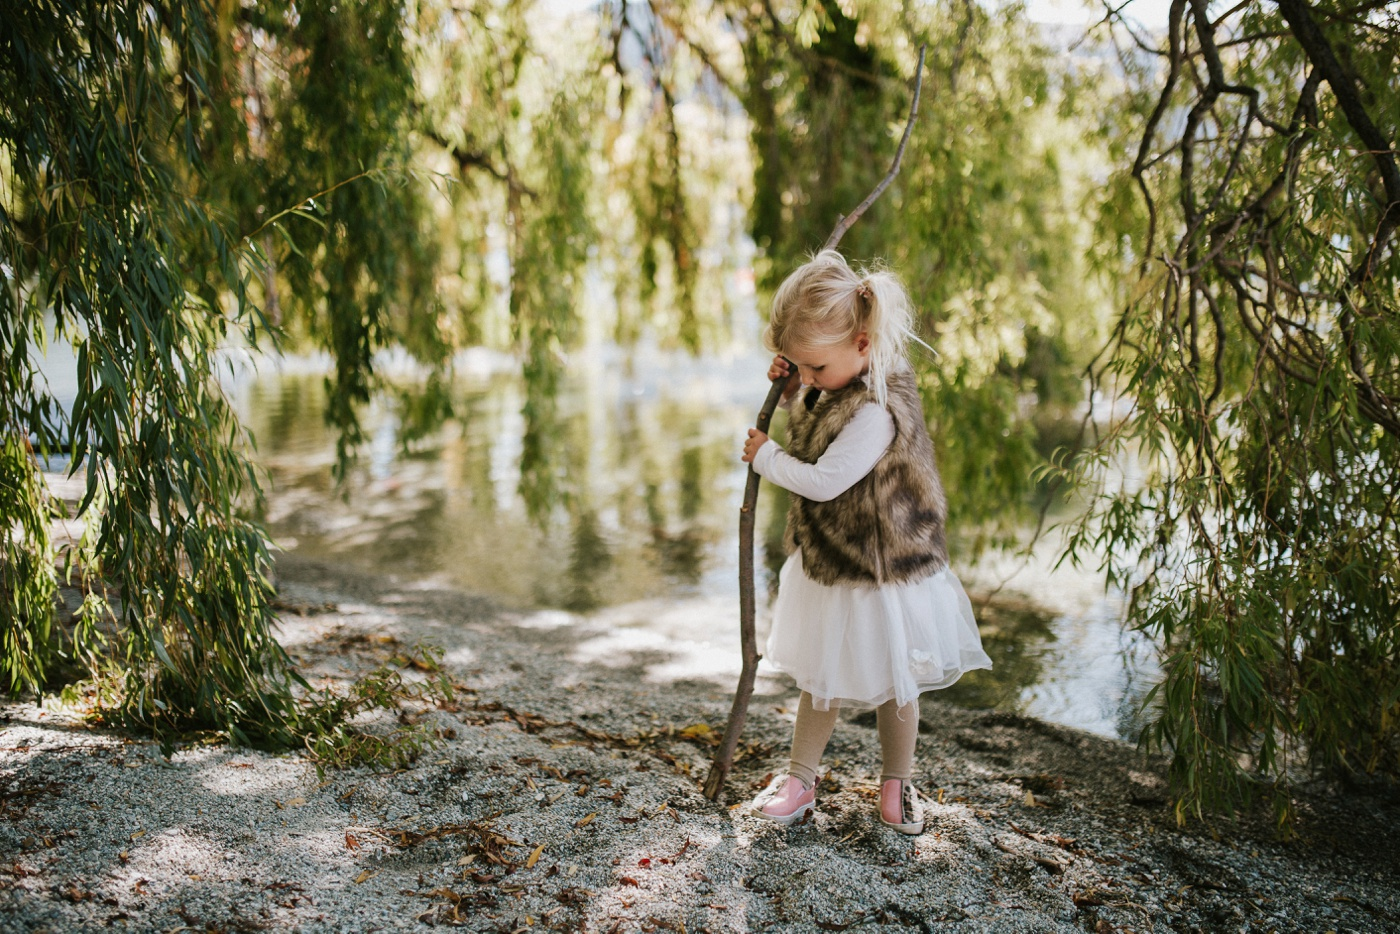 Blake-Lily-Rolig-Lekfull-Familjesession-Familjefotograf-Stockholm-Orebro_01